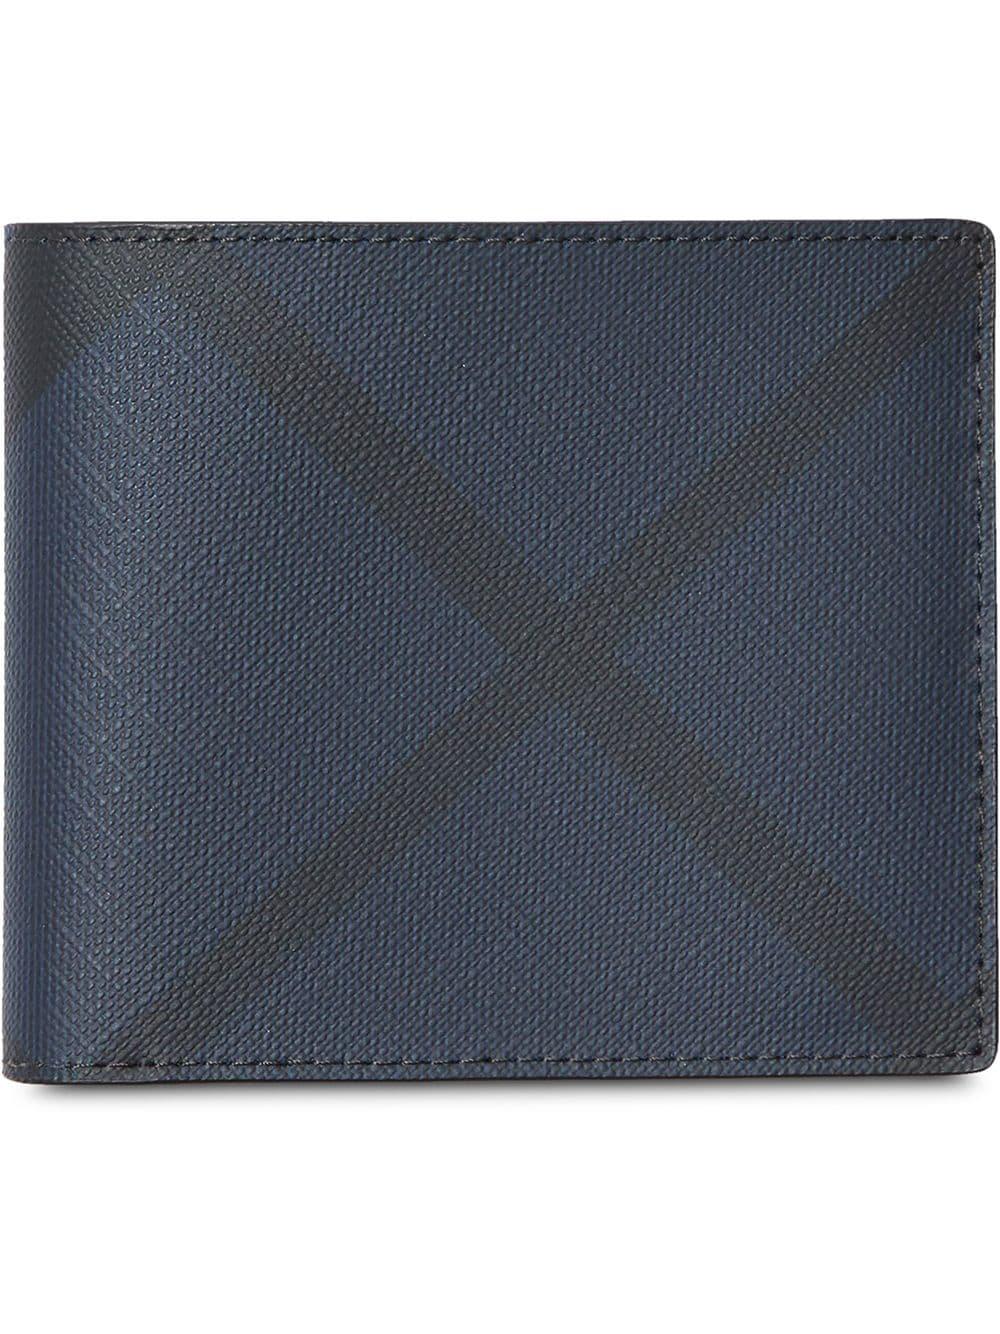 Beretta BriefCase business card holder-Great Gift Worldwide shipping